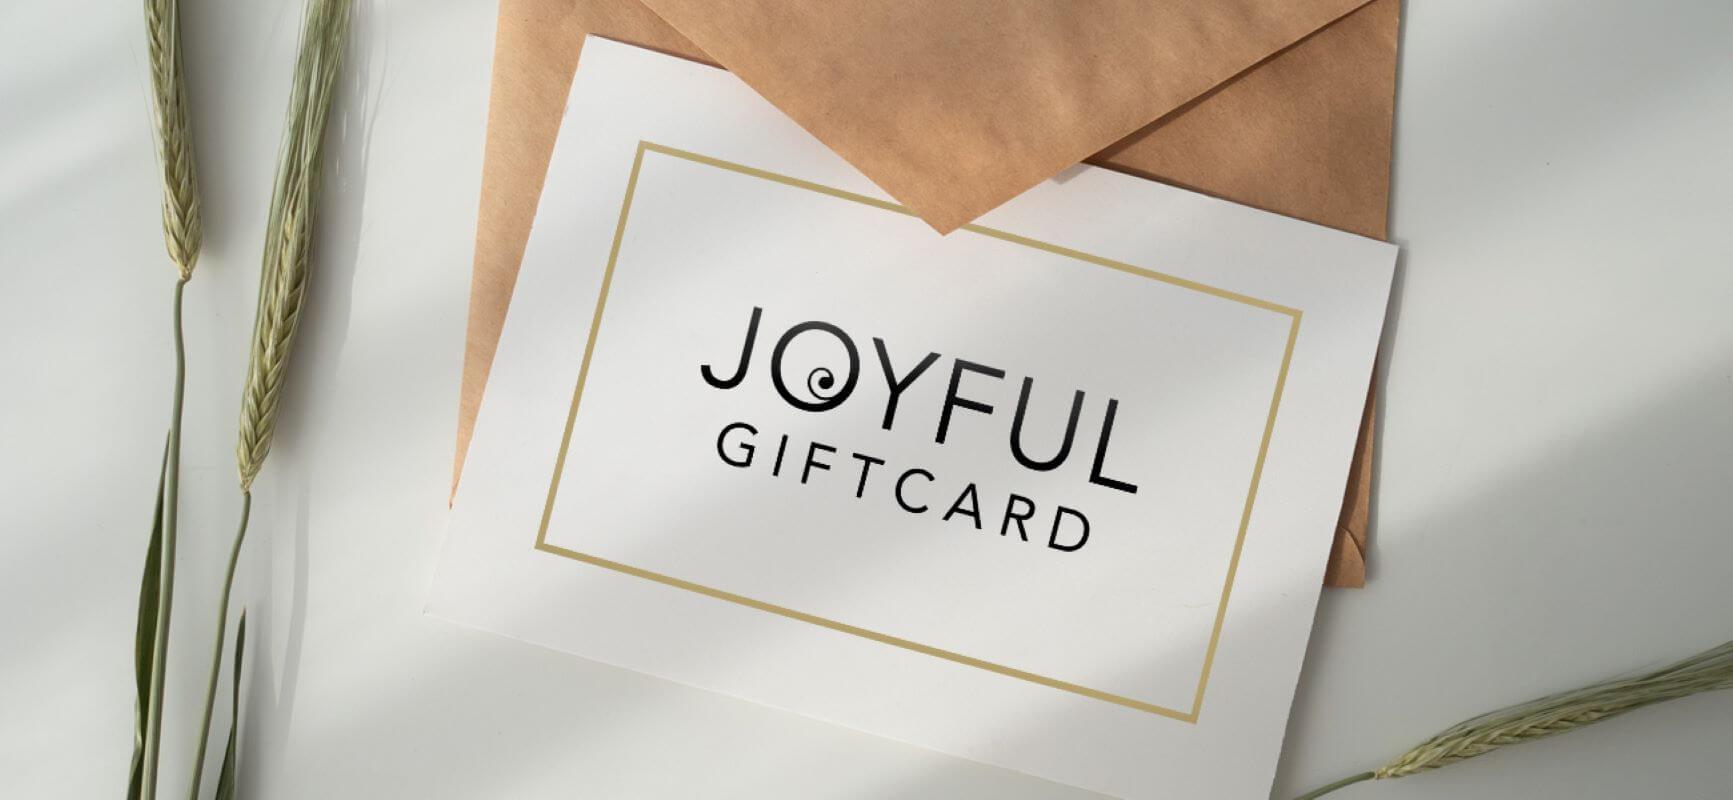 joyful_giftcard_2019_1300x600px_5